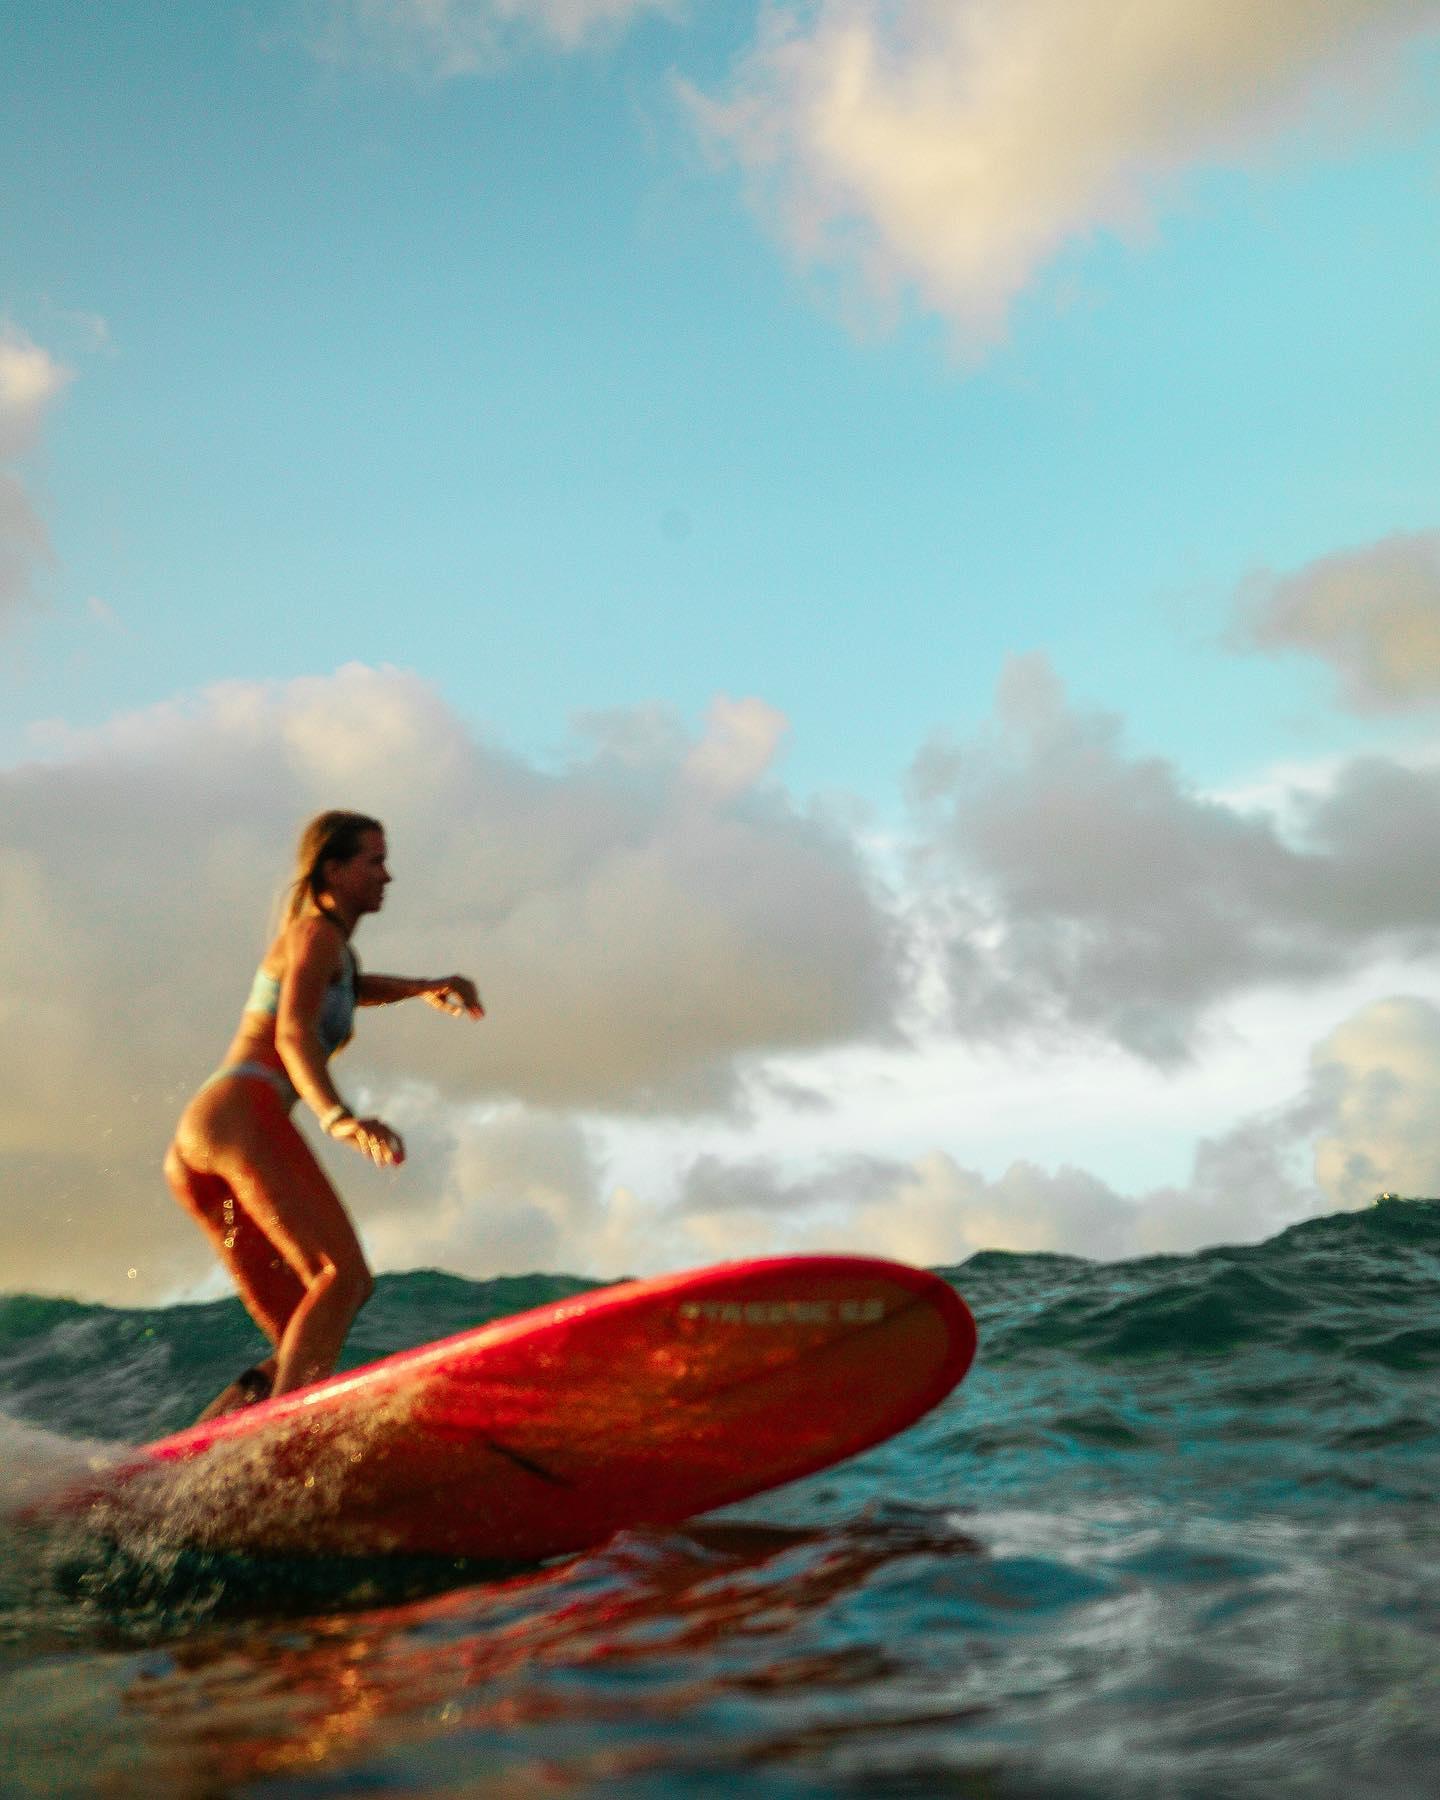 Badass Solo Surfer-girl Travel Guide